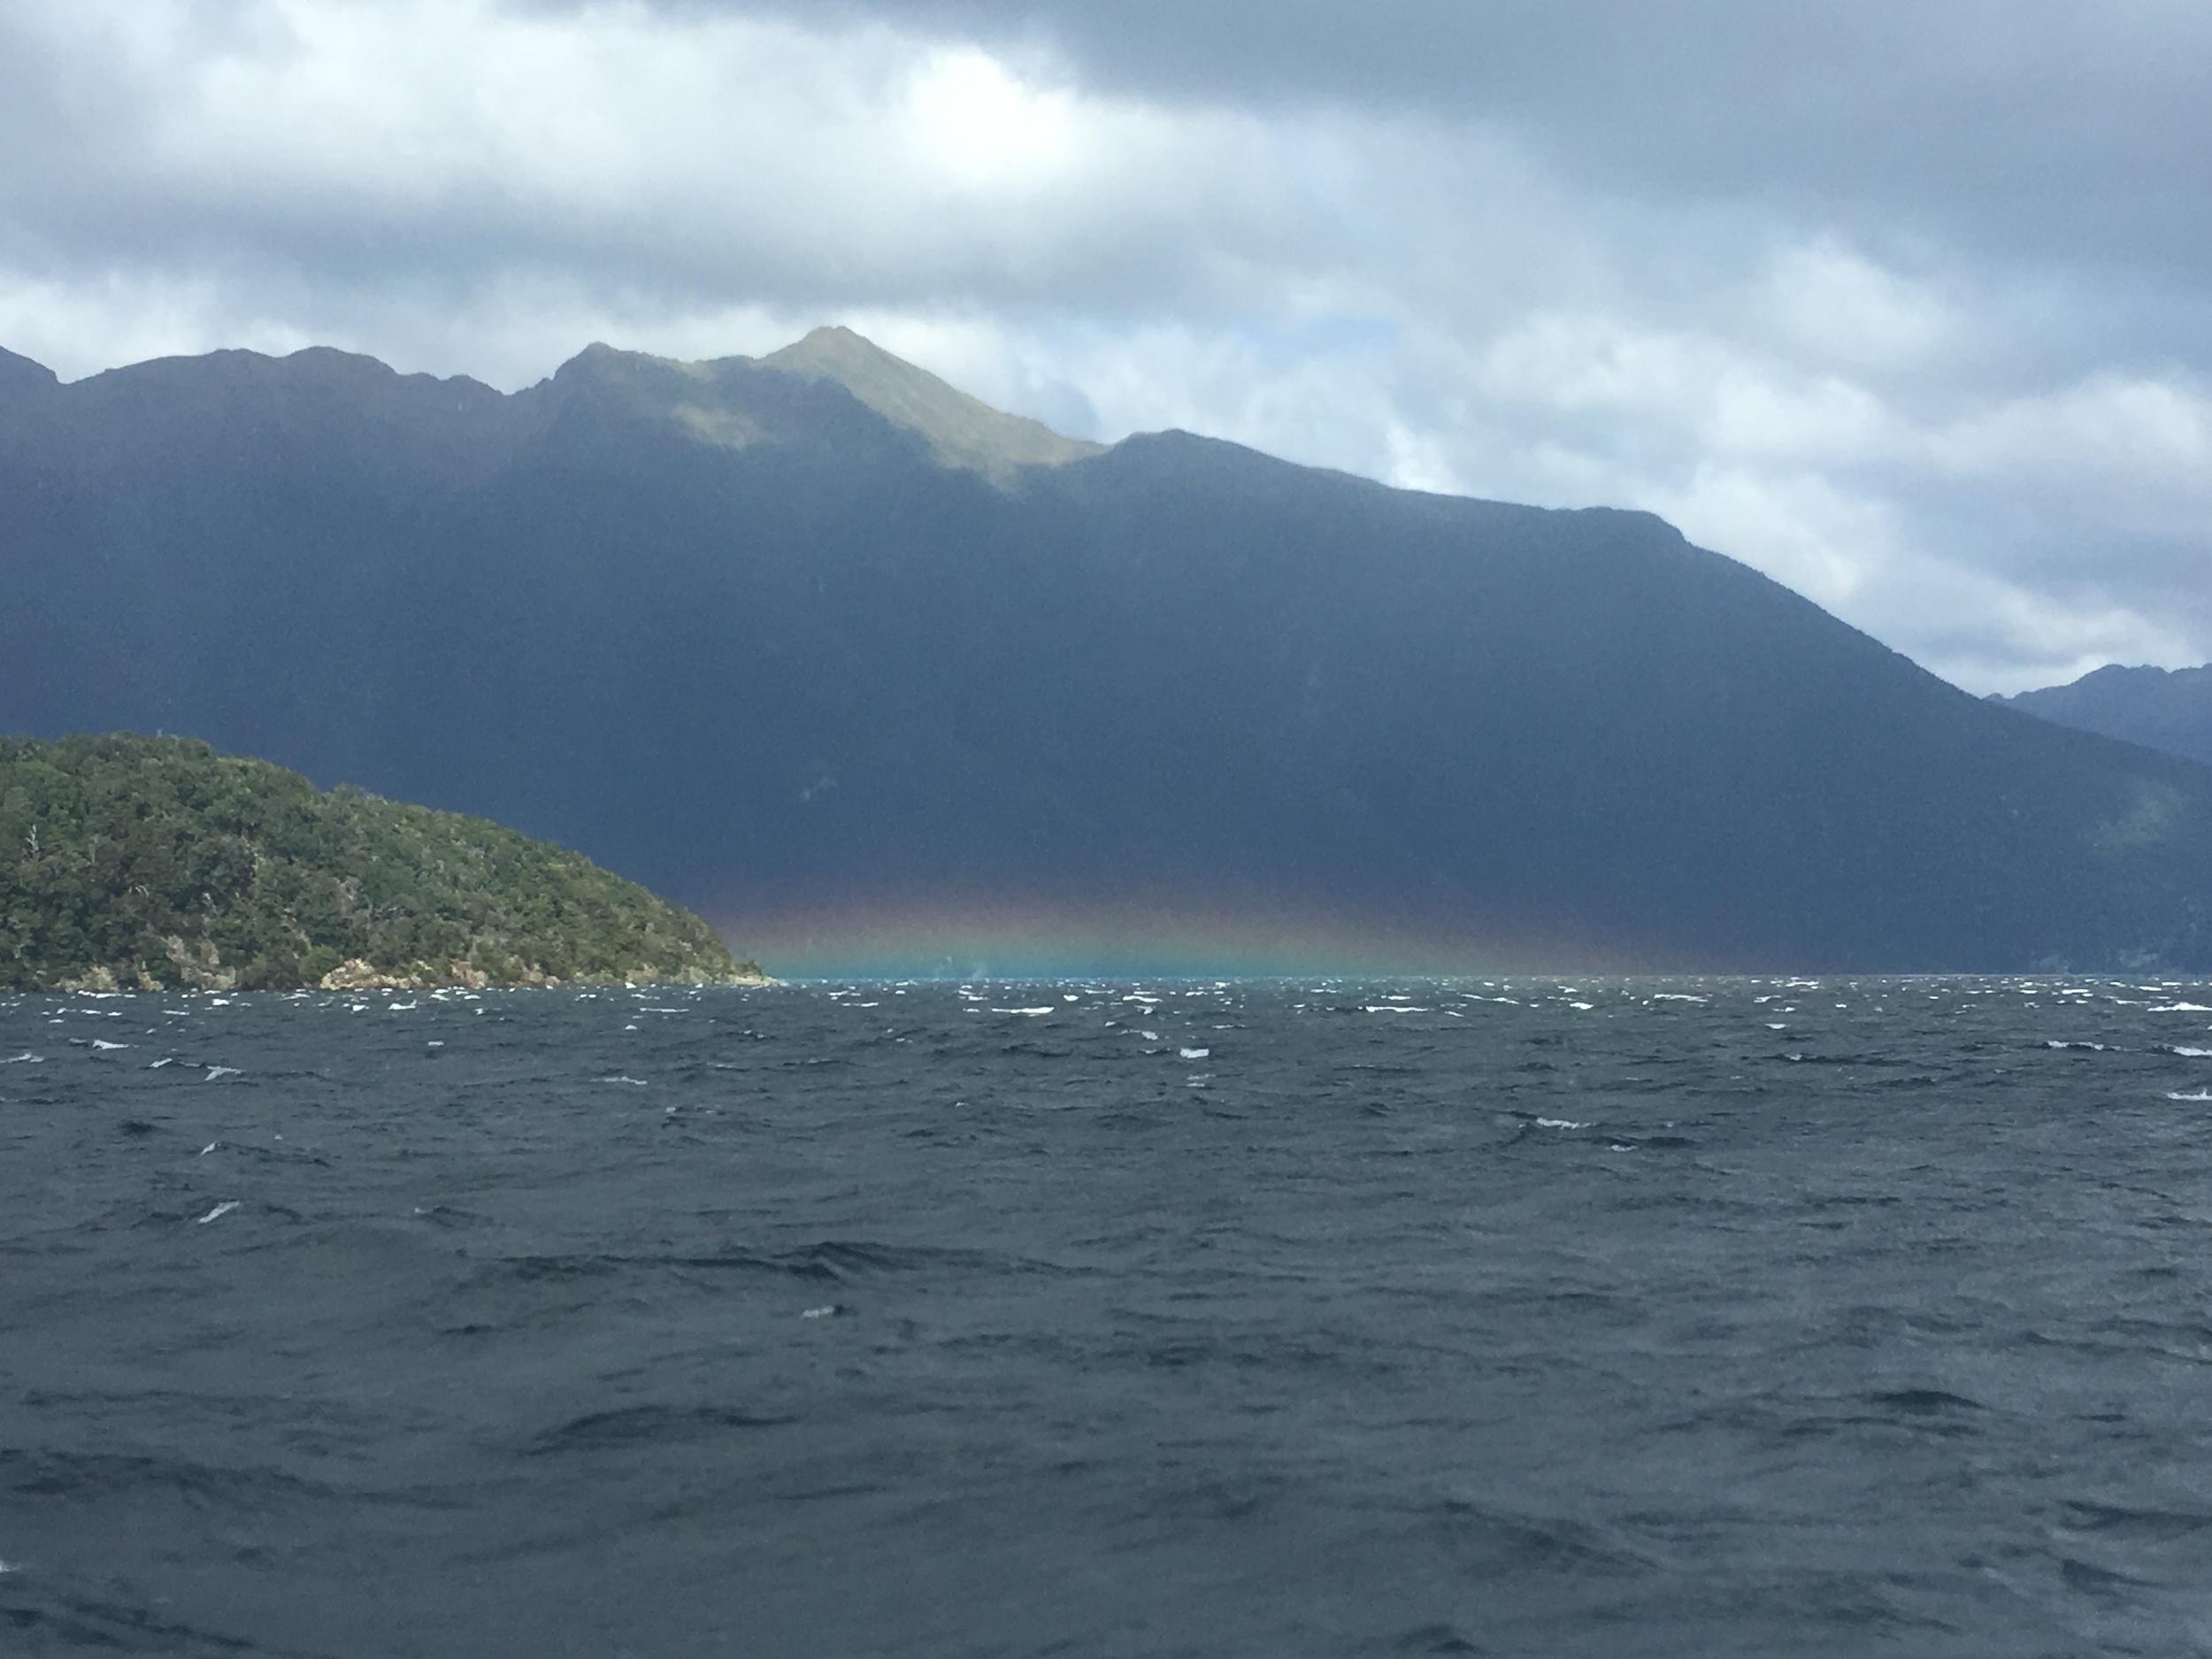 Hovering Rainbow